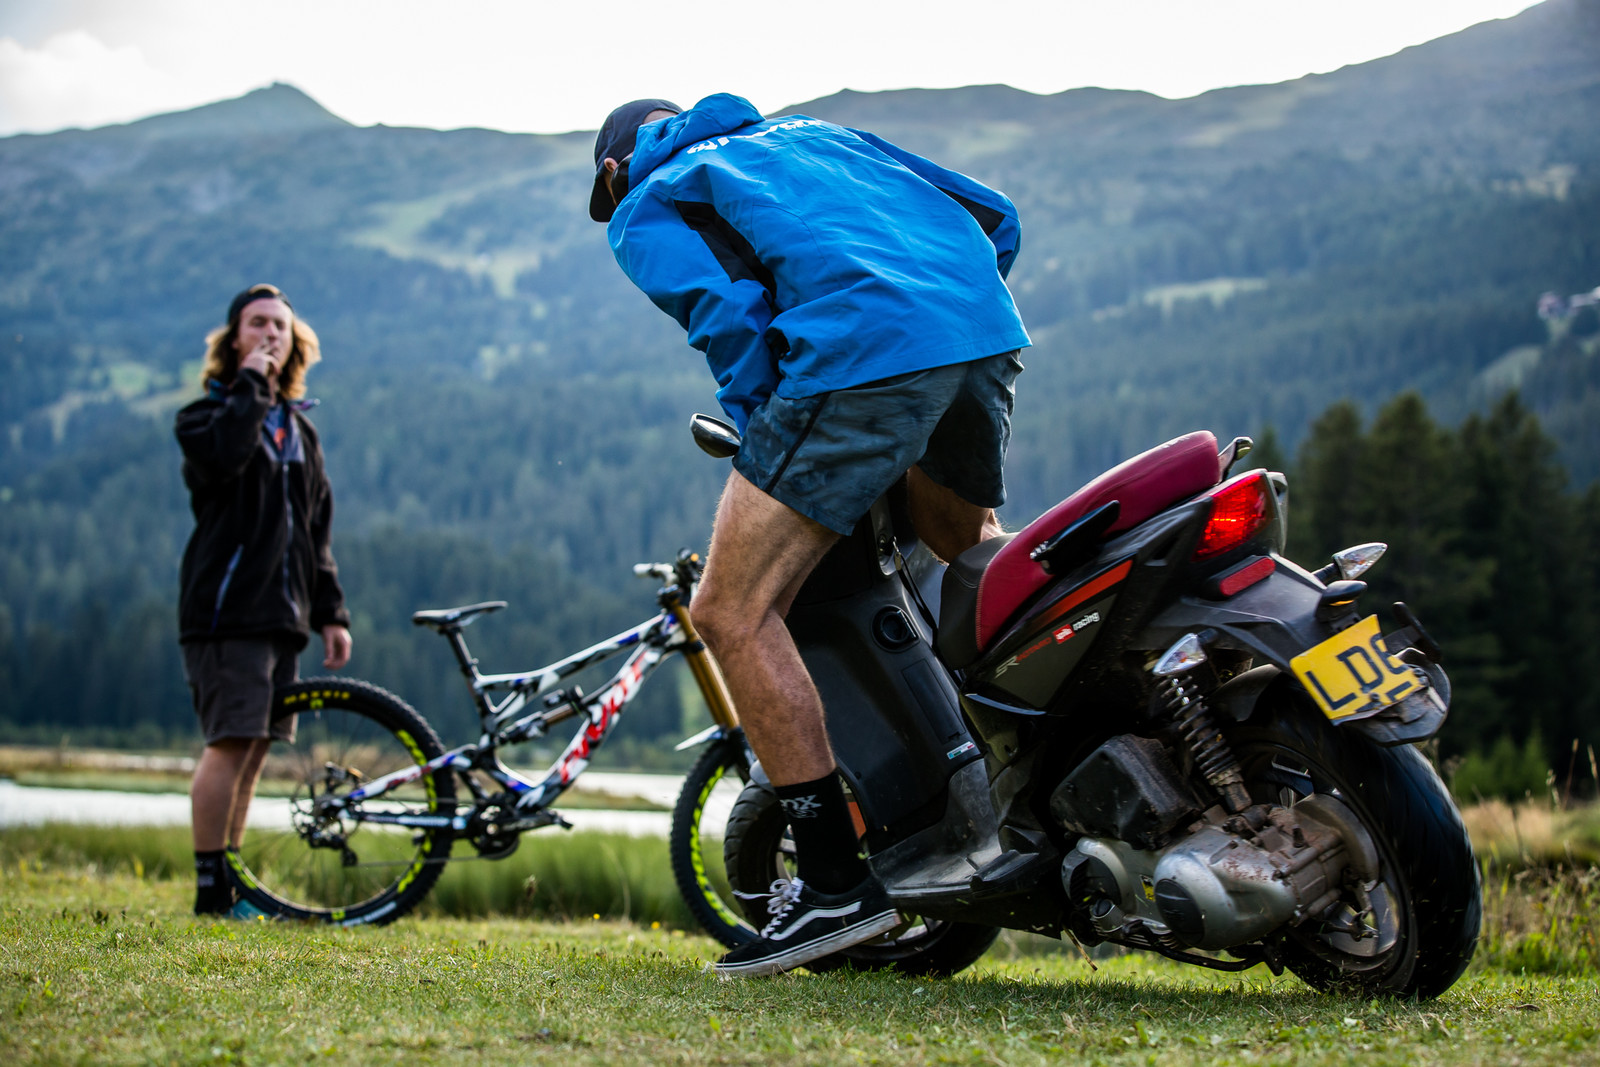 Hooligan - WORLD CHAMPS BIKE - Eddie Masters' Pivot Phoenix - Mountain Biking Pictures - Vital MTB